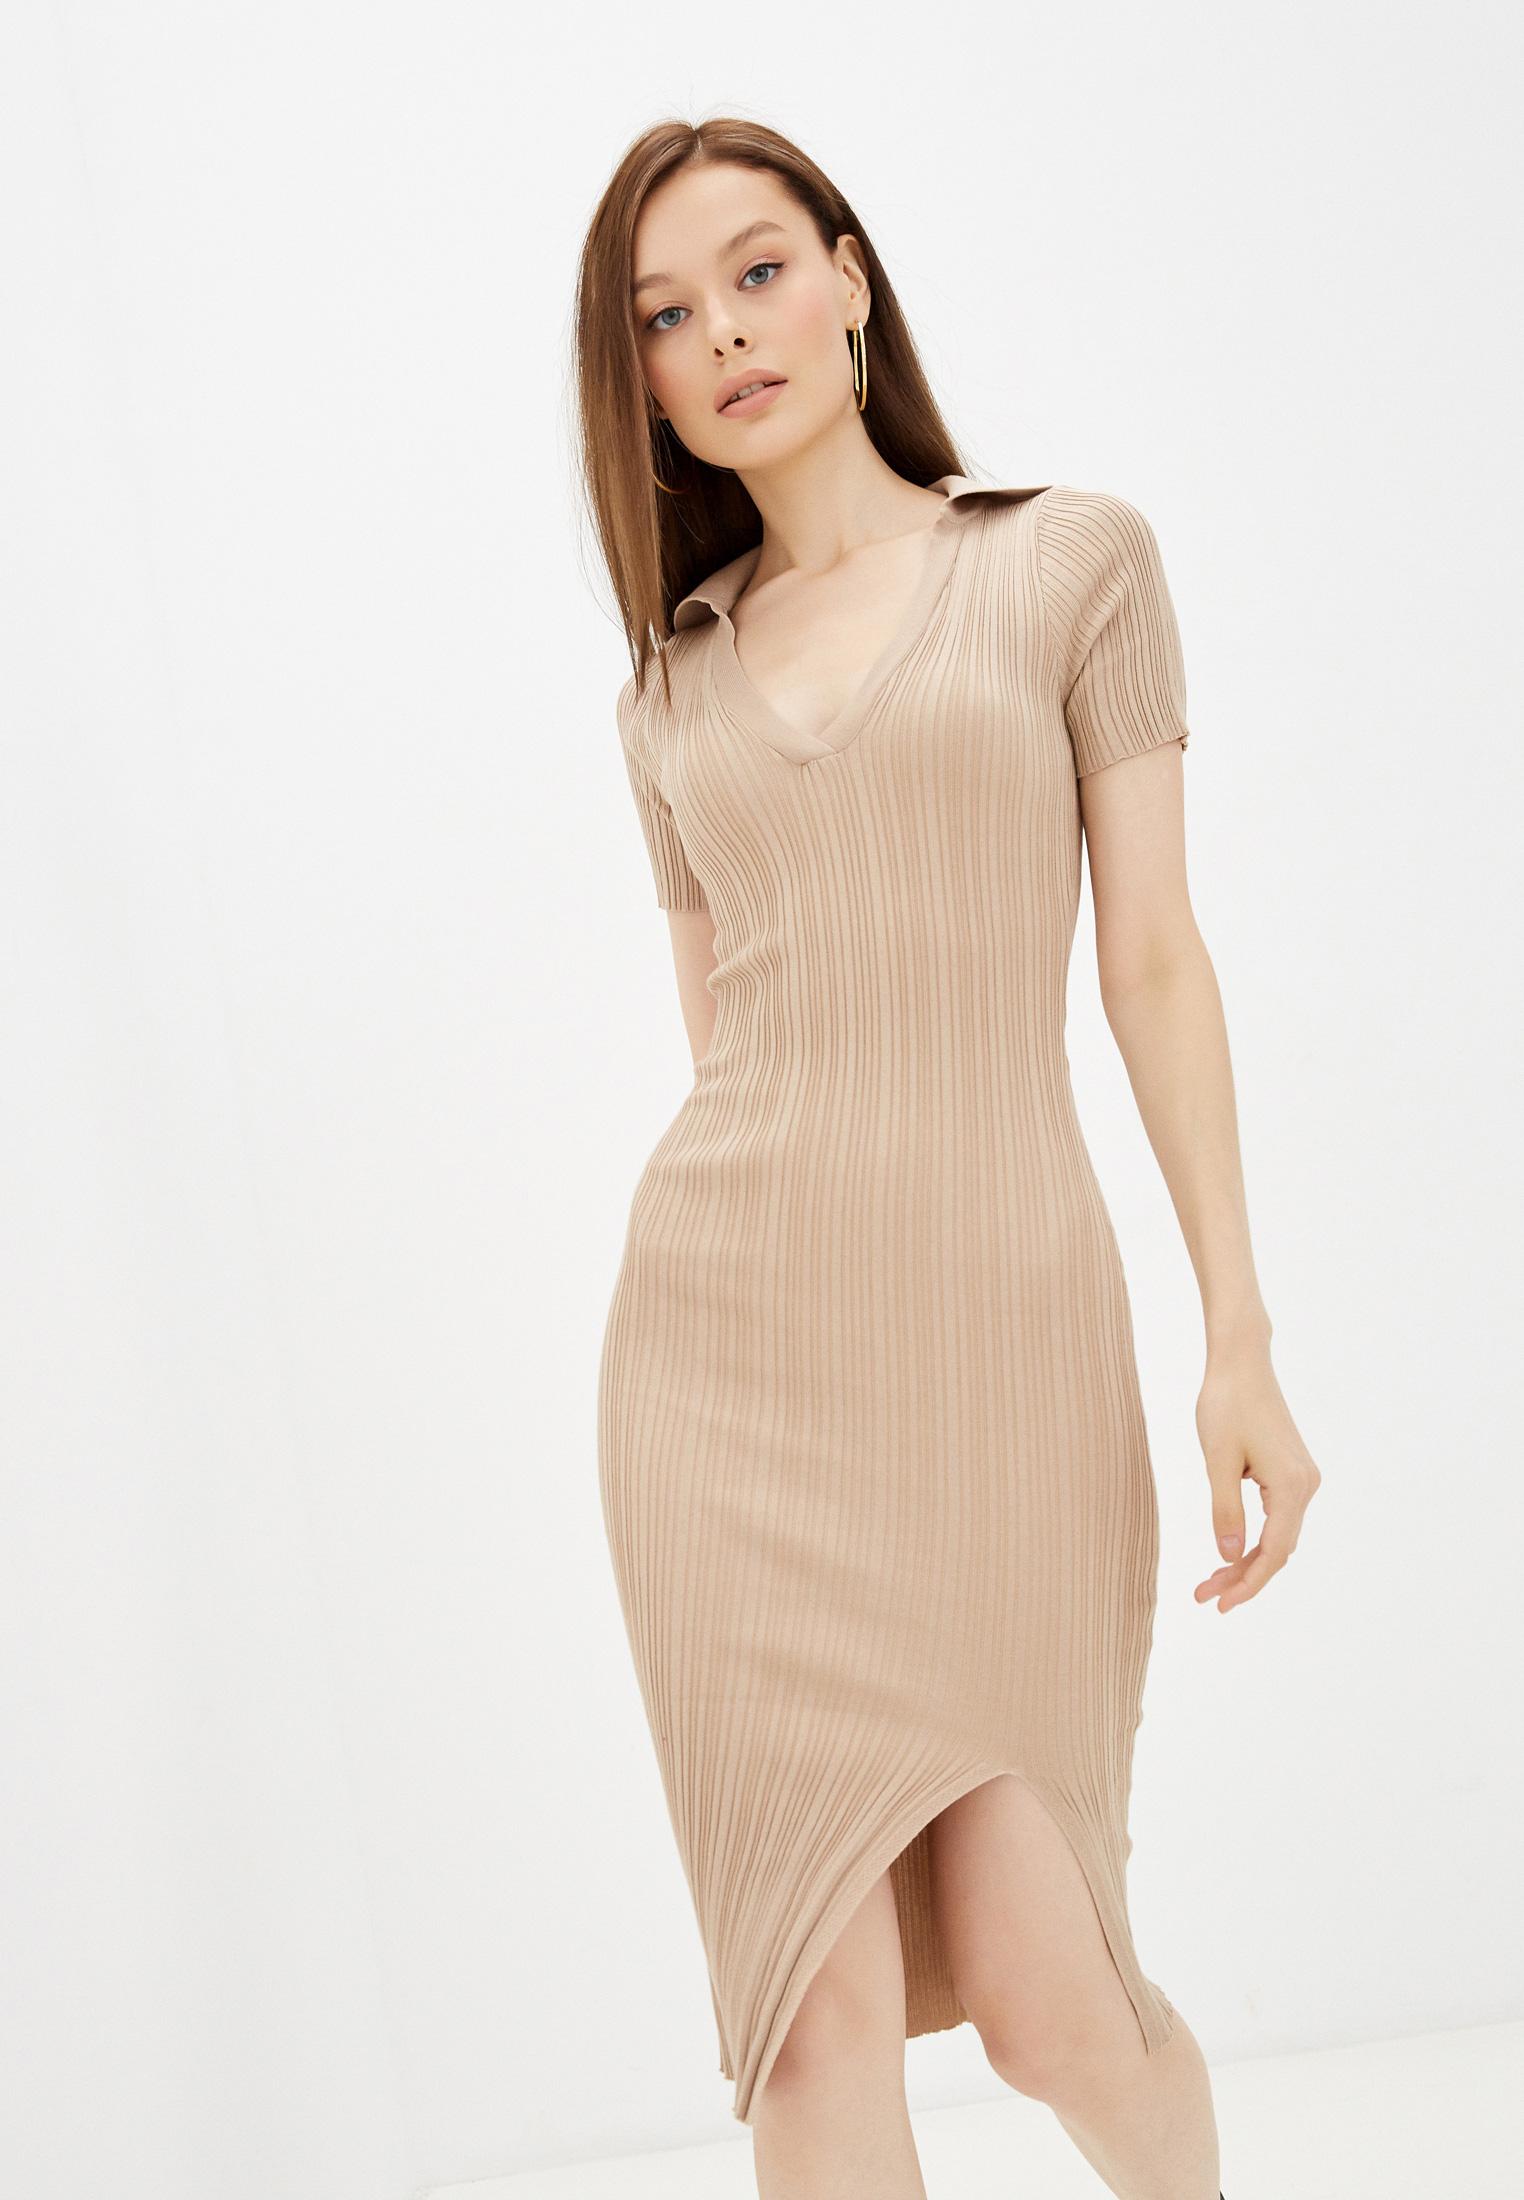 Вязаное платье Miss Gabby 3641-3